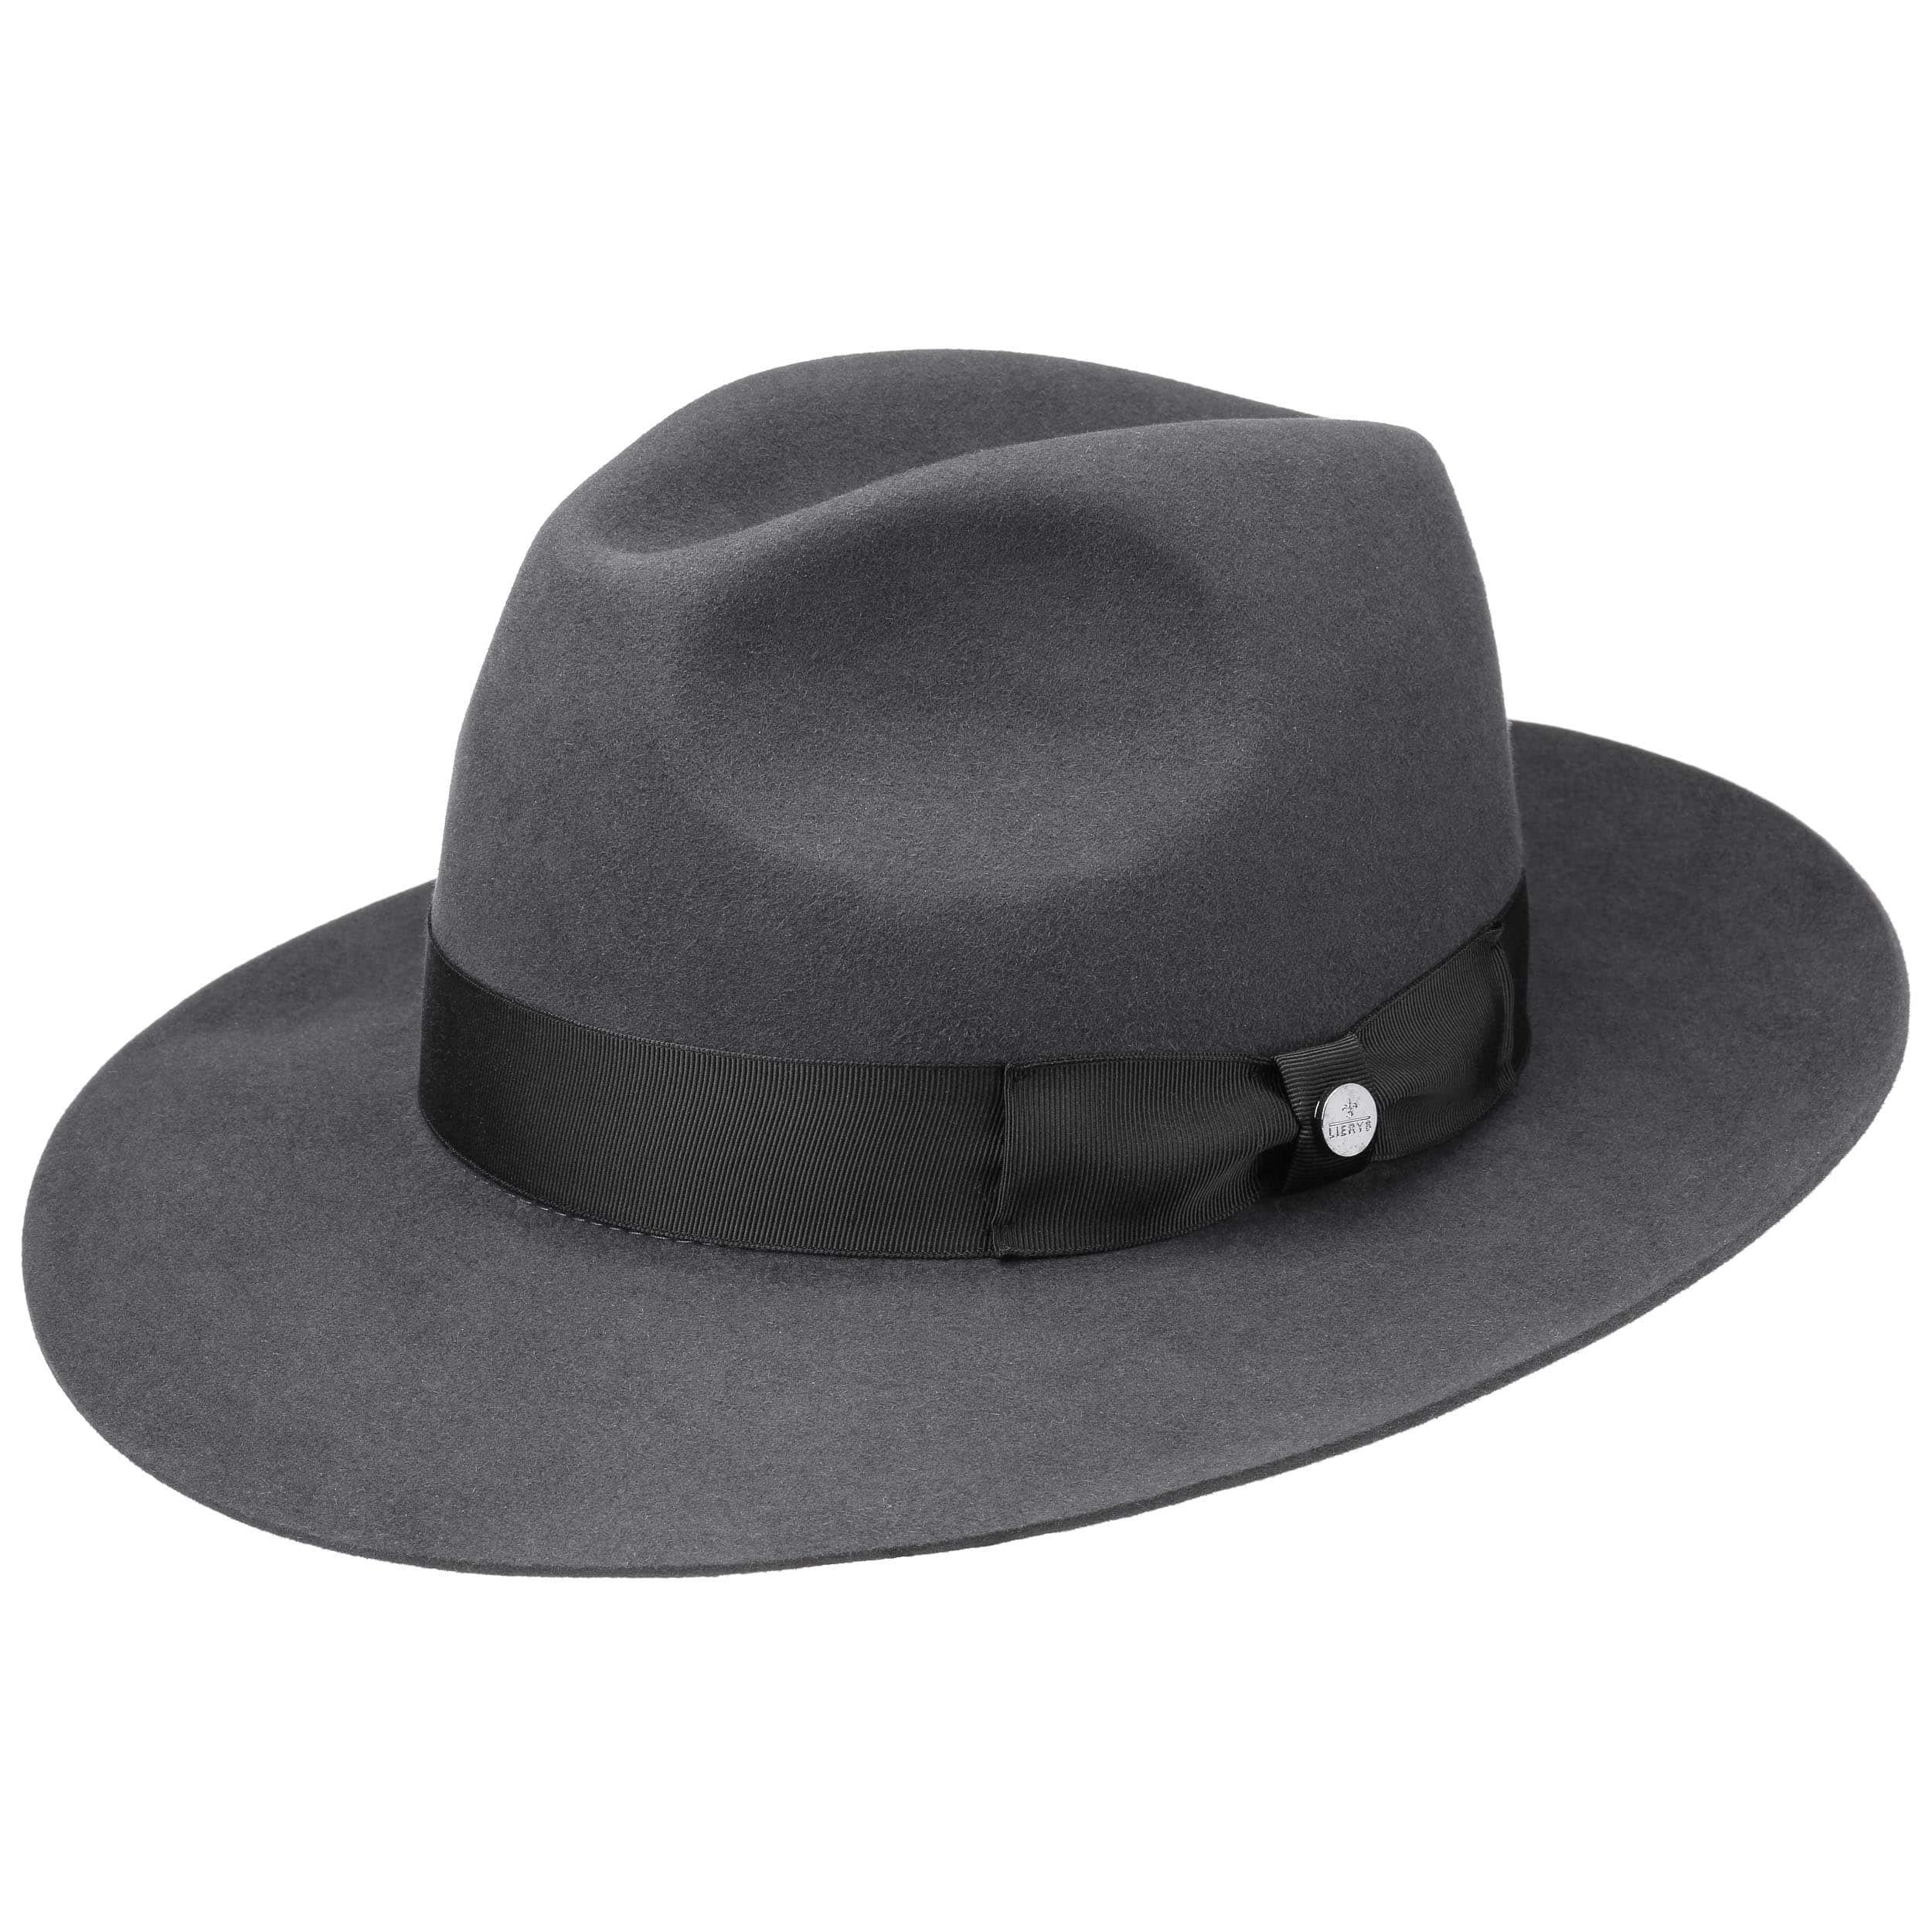 ... Bogart Hat Fur Felt by Lierys - grey 6 ... b949d1721c9